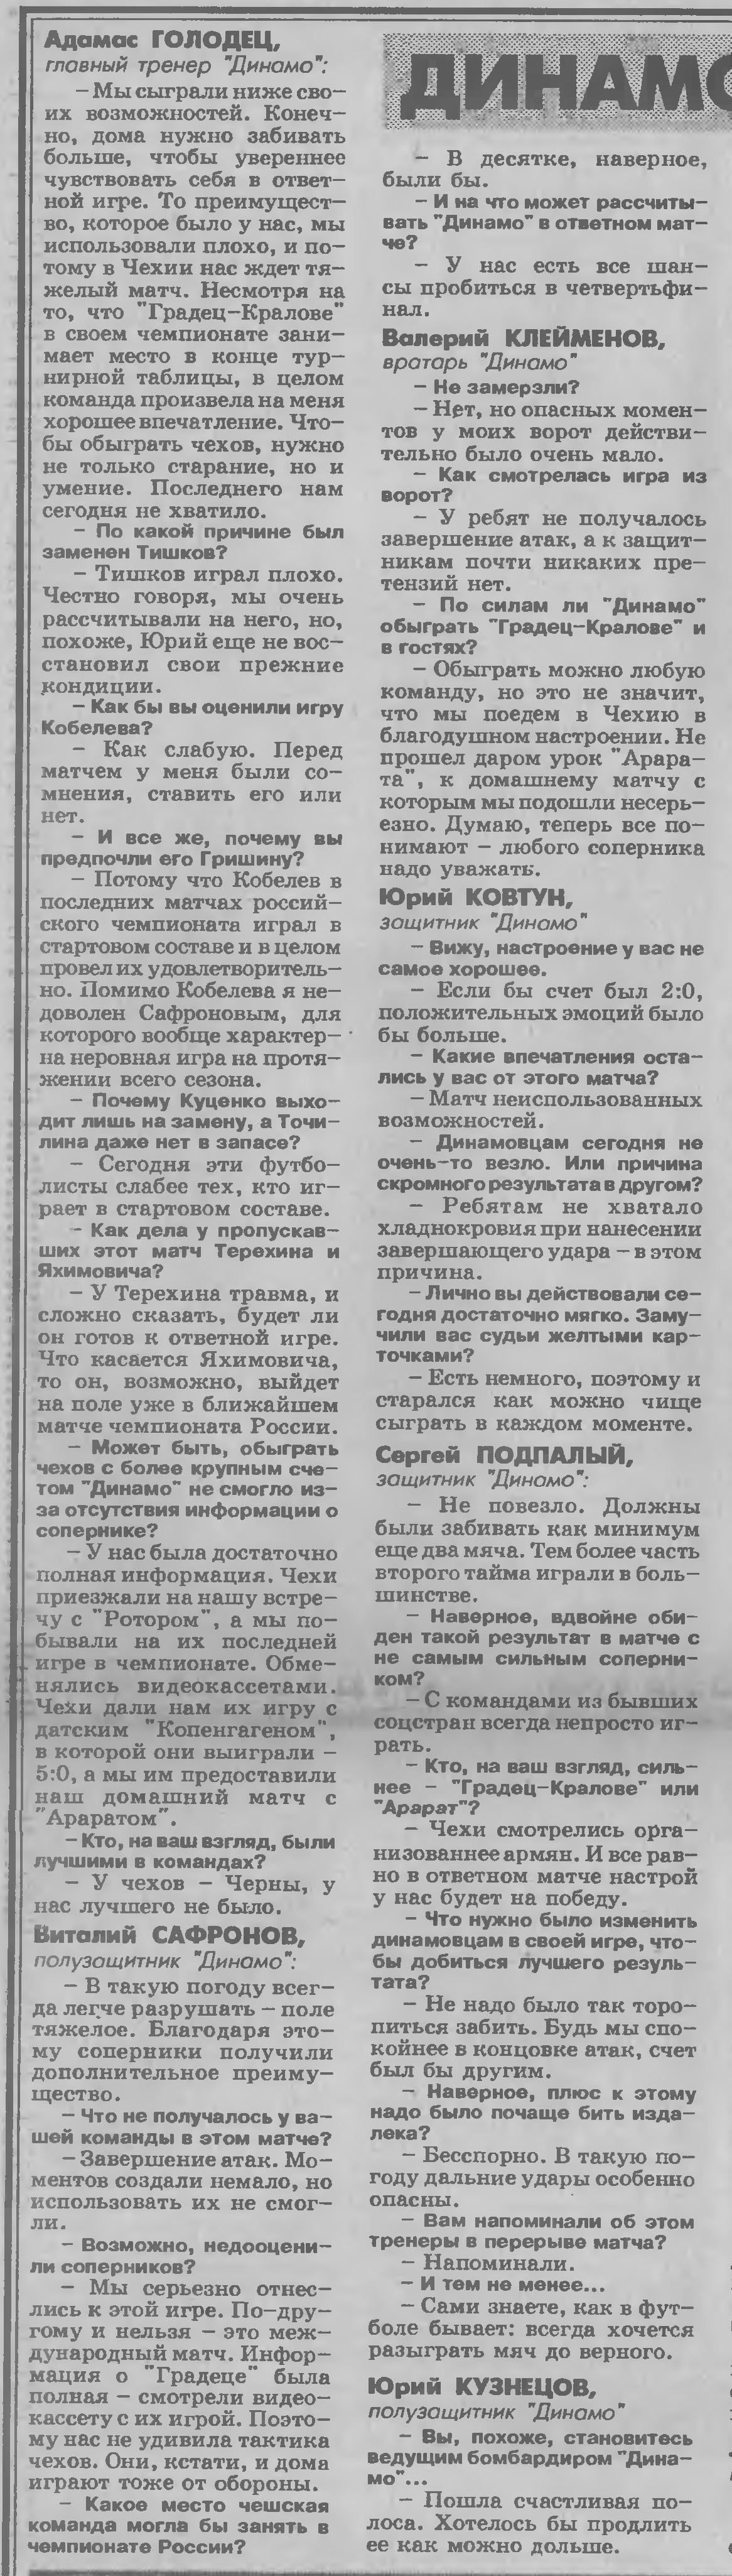 Динамо (Россия) - Градец Кралове (Чехия) 1:0